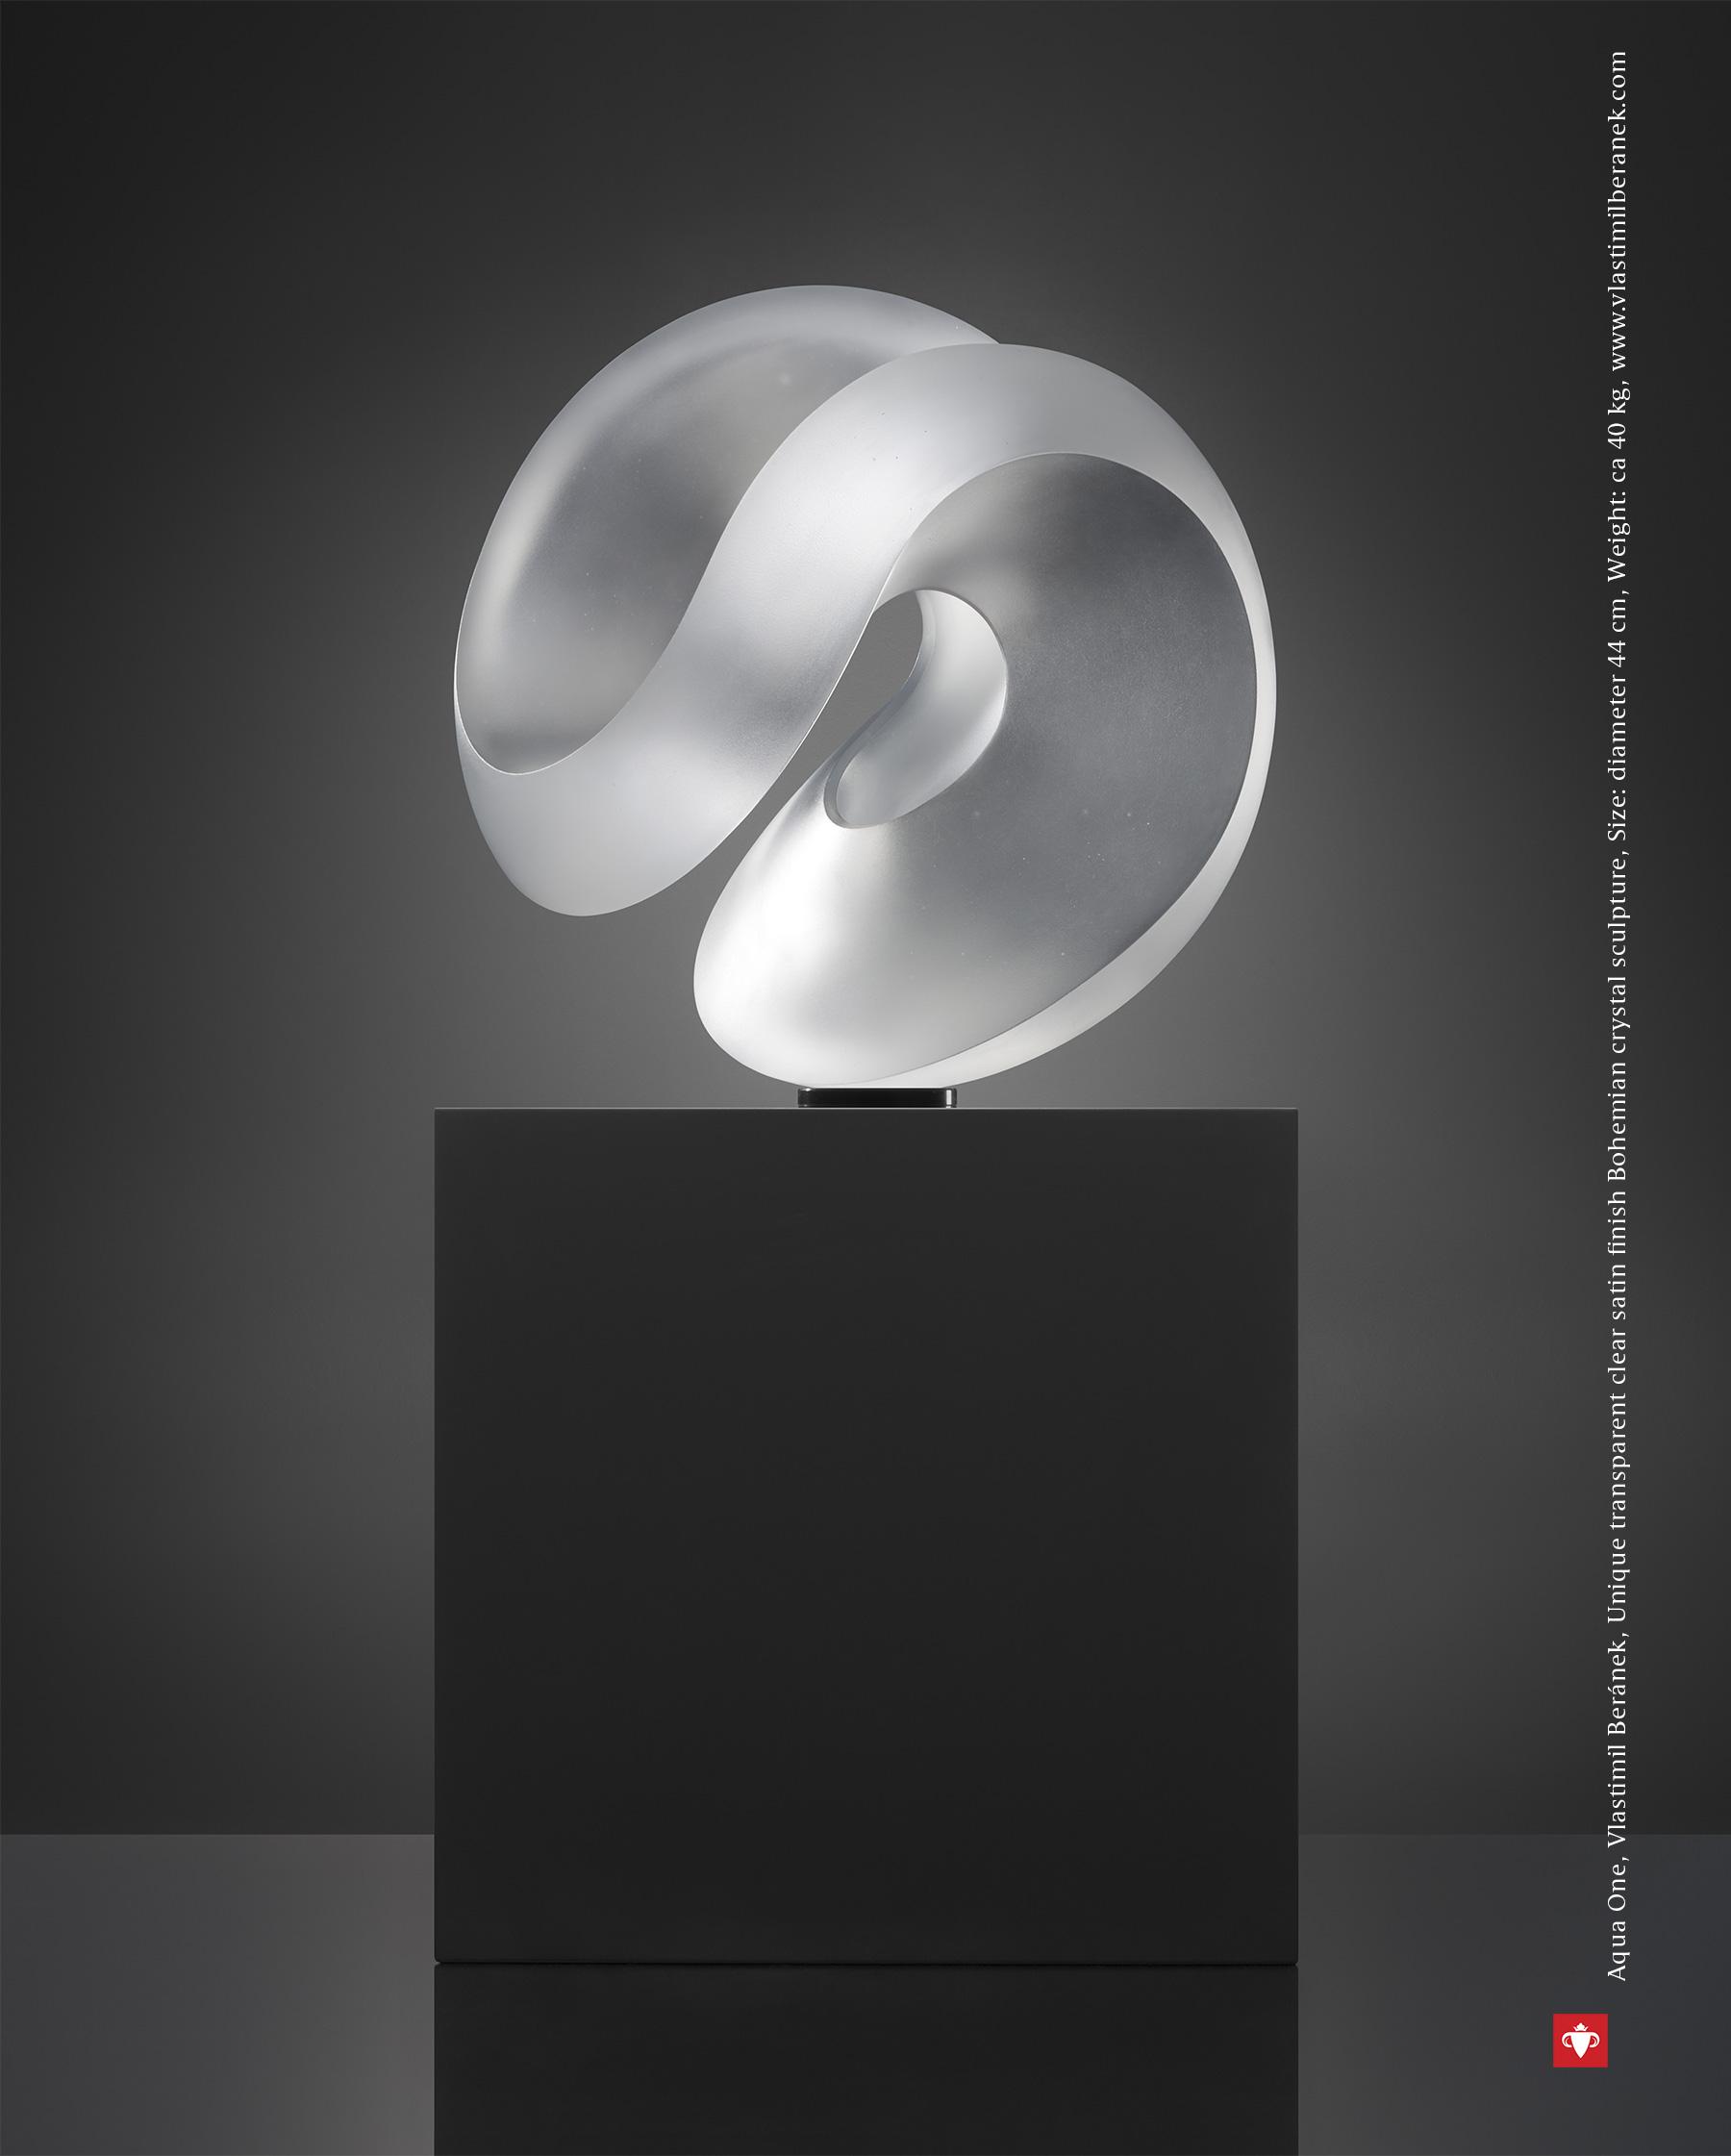 The Best of Glass Sculpture Art: Vlastimil Beránek glass sculpture The Best of Glass Sculpture Art: Vlastimil Beránek Aqua One Vlastimil Beranek